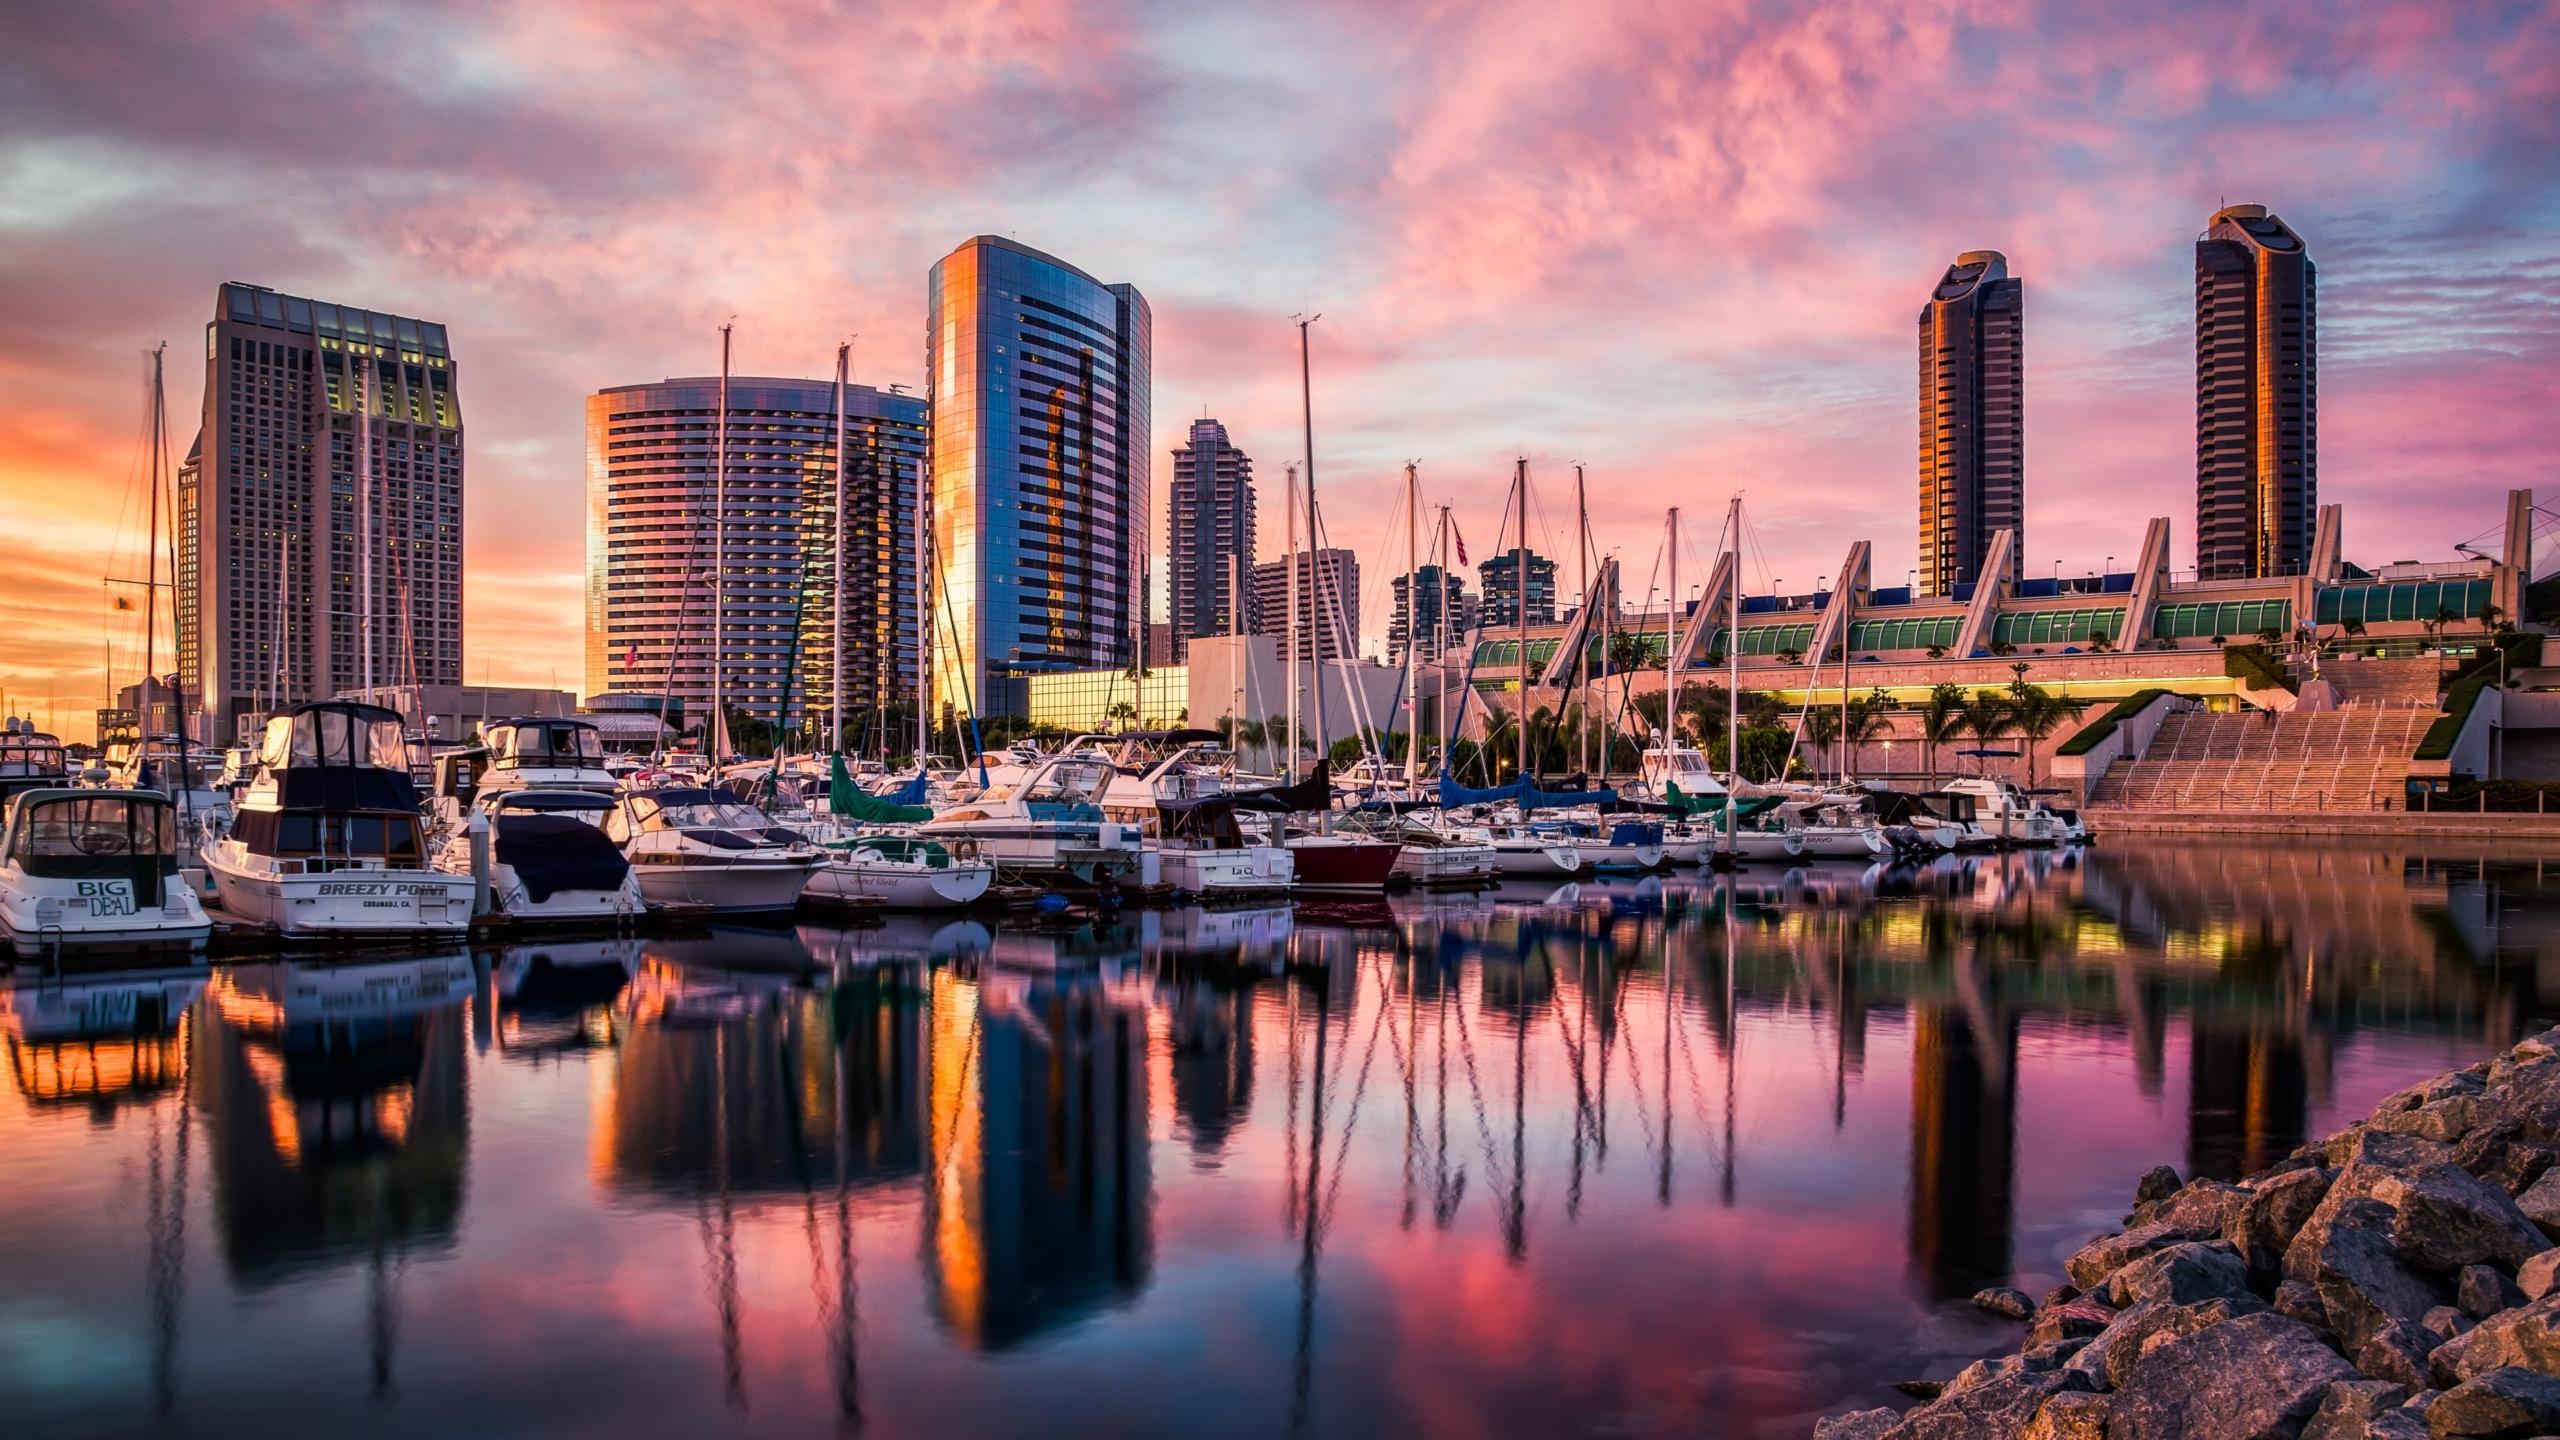 San Diego Picture design – Captivating Home Decor